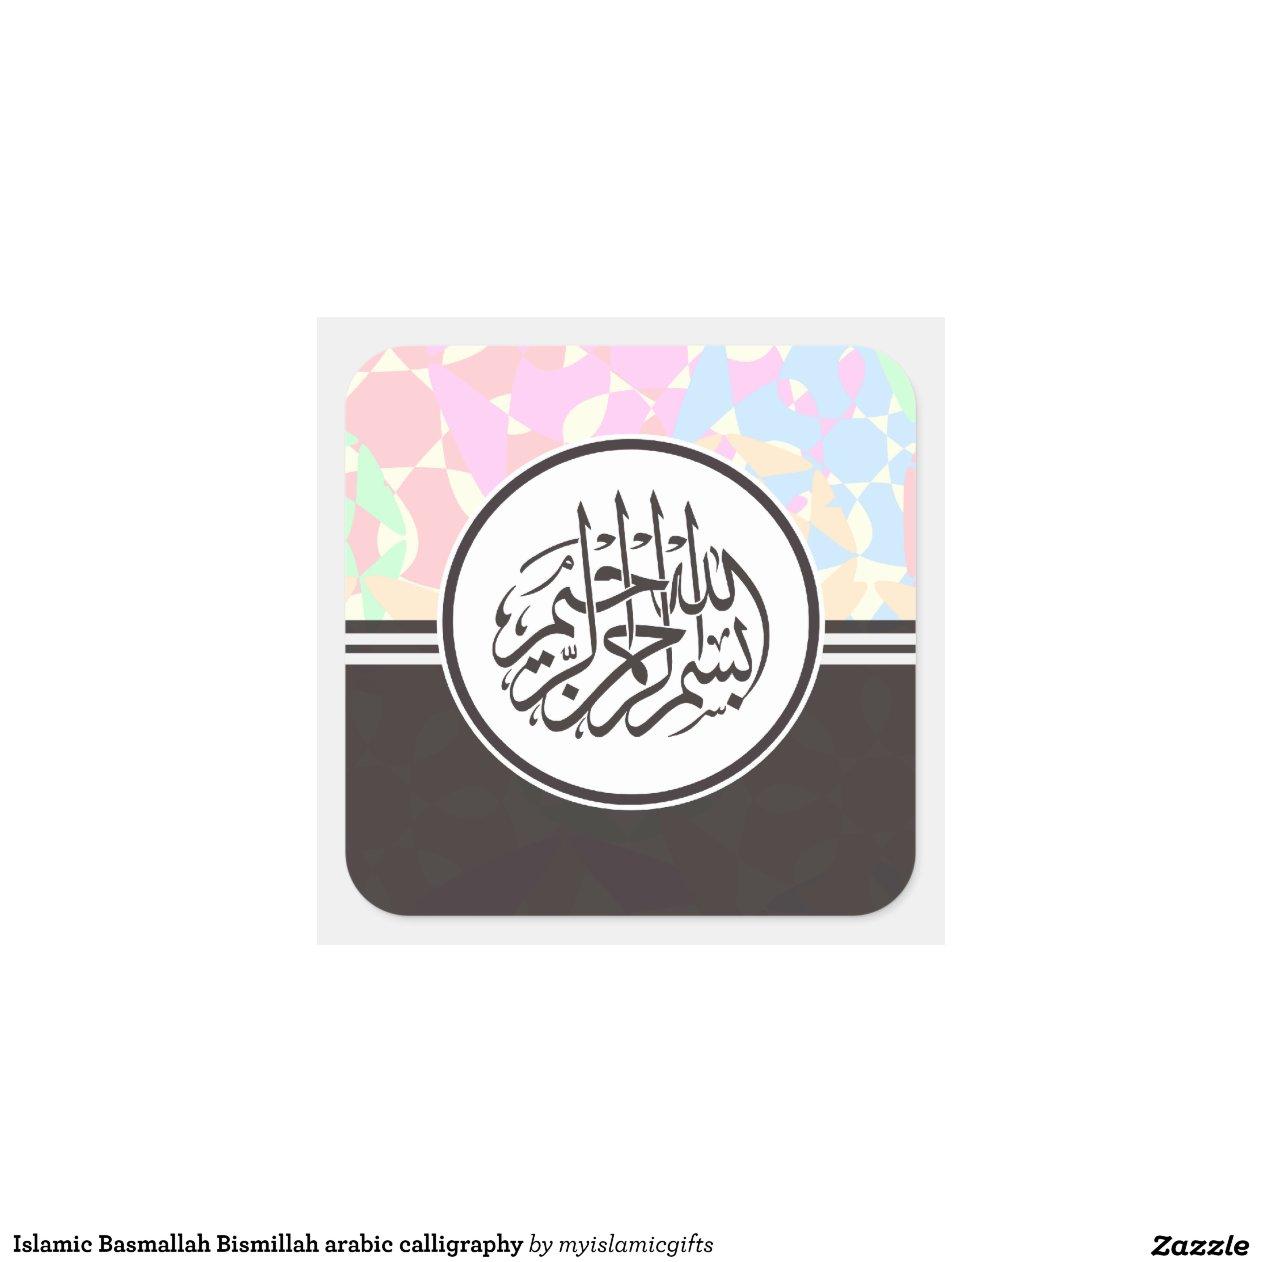 islamic basmallah bismillah arabic calligraphy square sticker zazzle. Black Bedroom Furniture Sets. Home Design Ideas